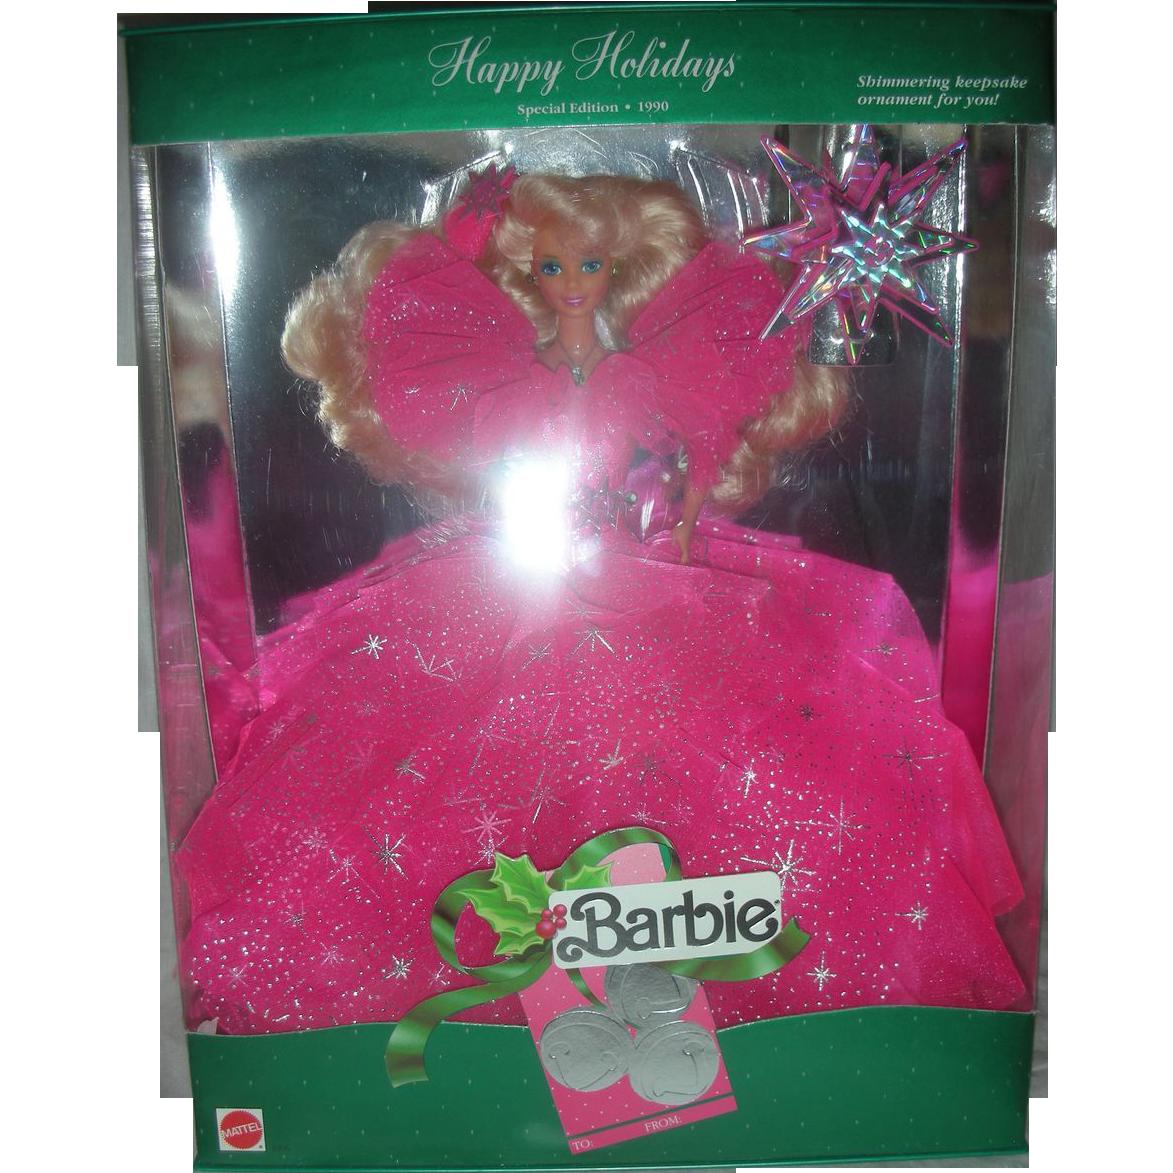 Vintage Happy Holiday Barbie Doll 1990 NRFB